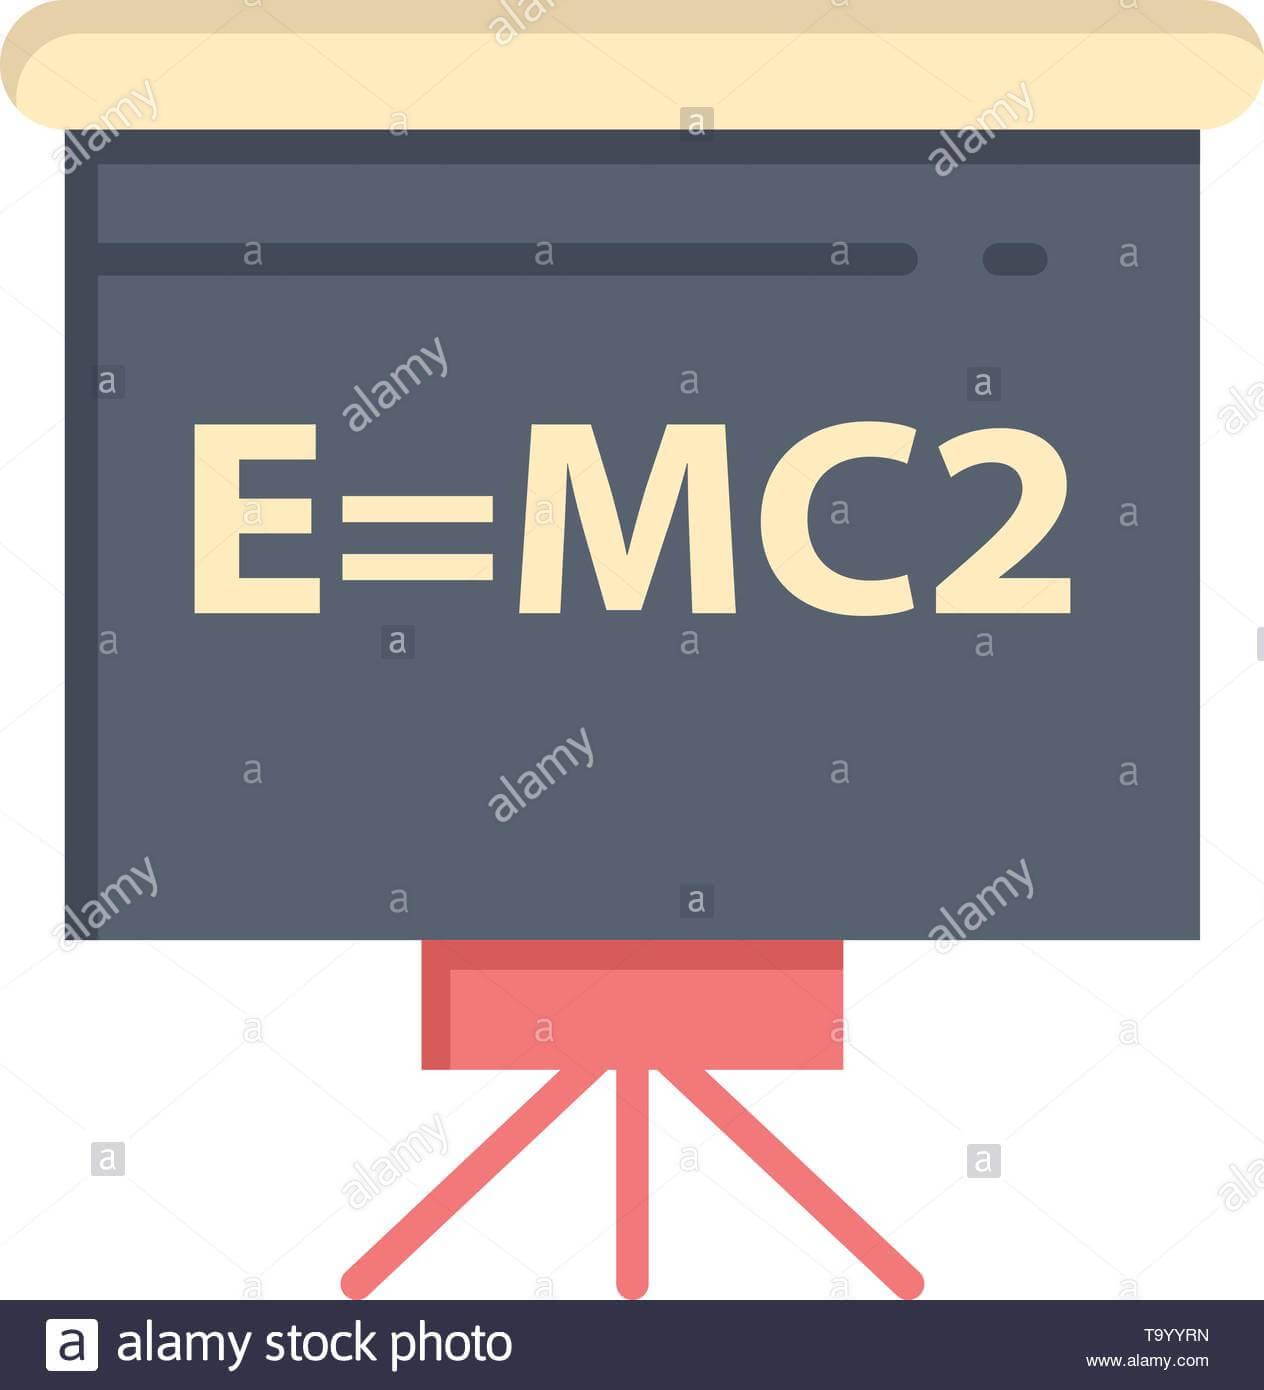 Classroom, Teacher, Board, Education Flat Color Icon. Vector For Classroom Banner Template